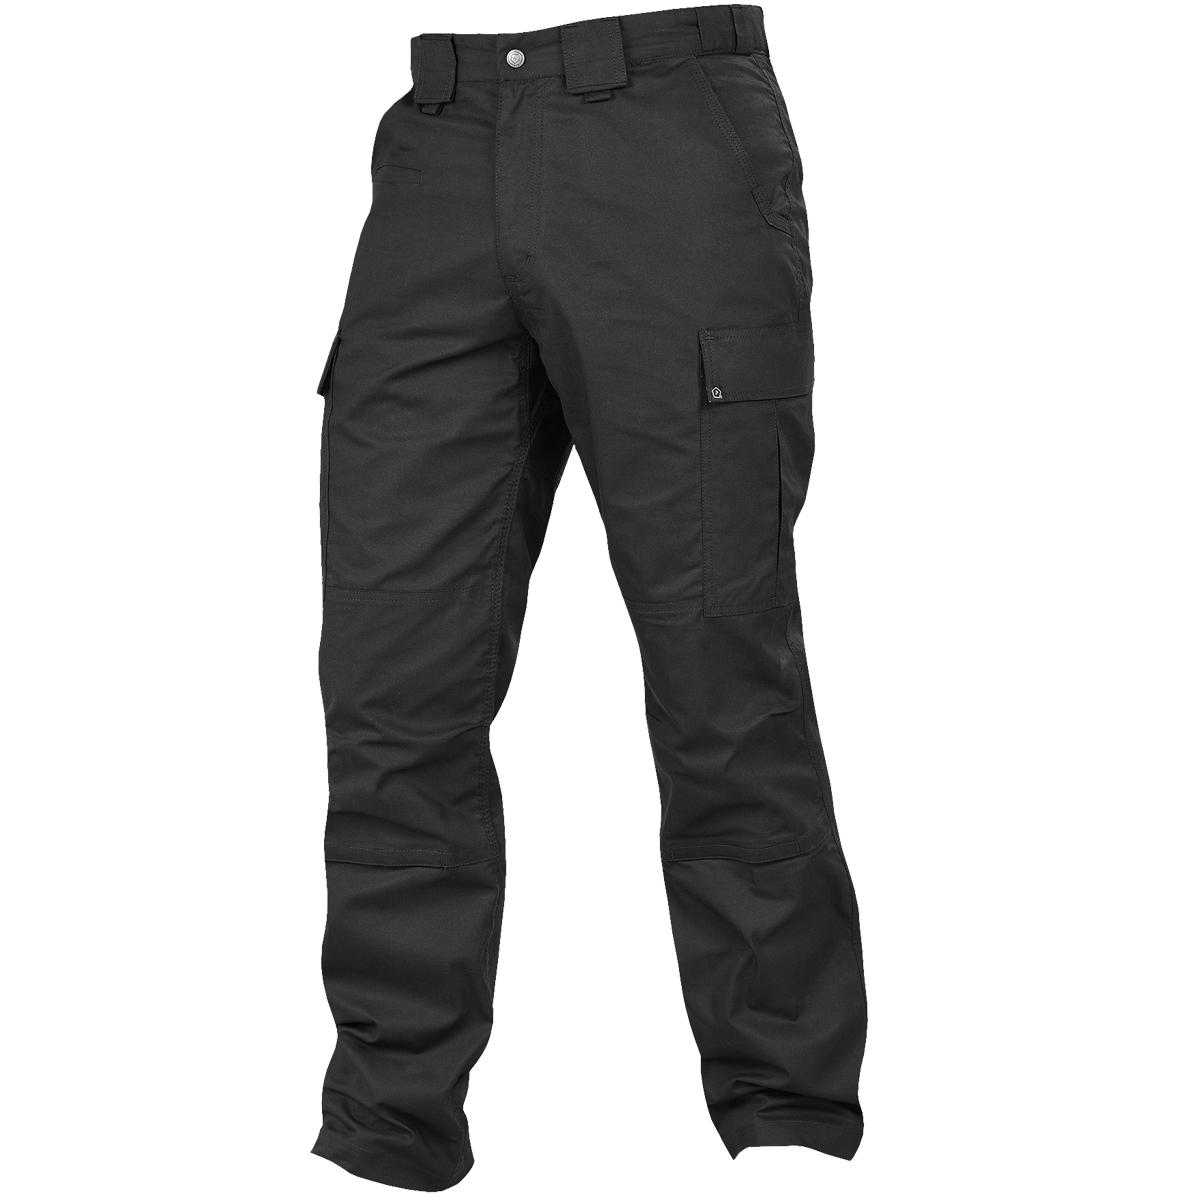 Share Men s black cargo pants consider, that